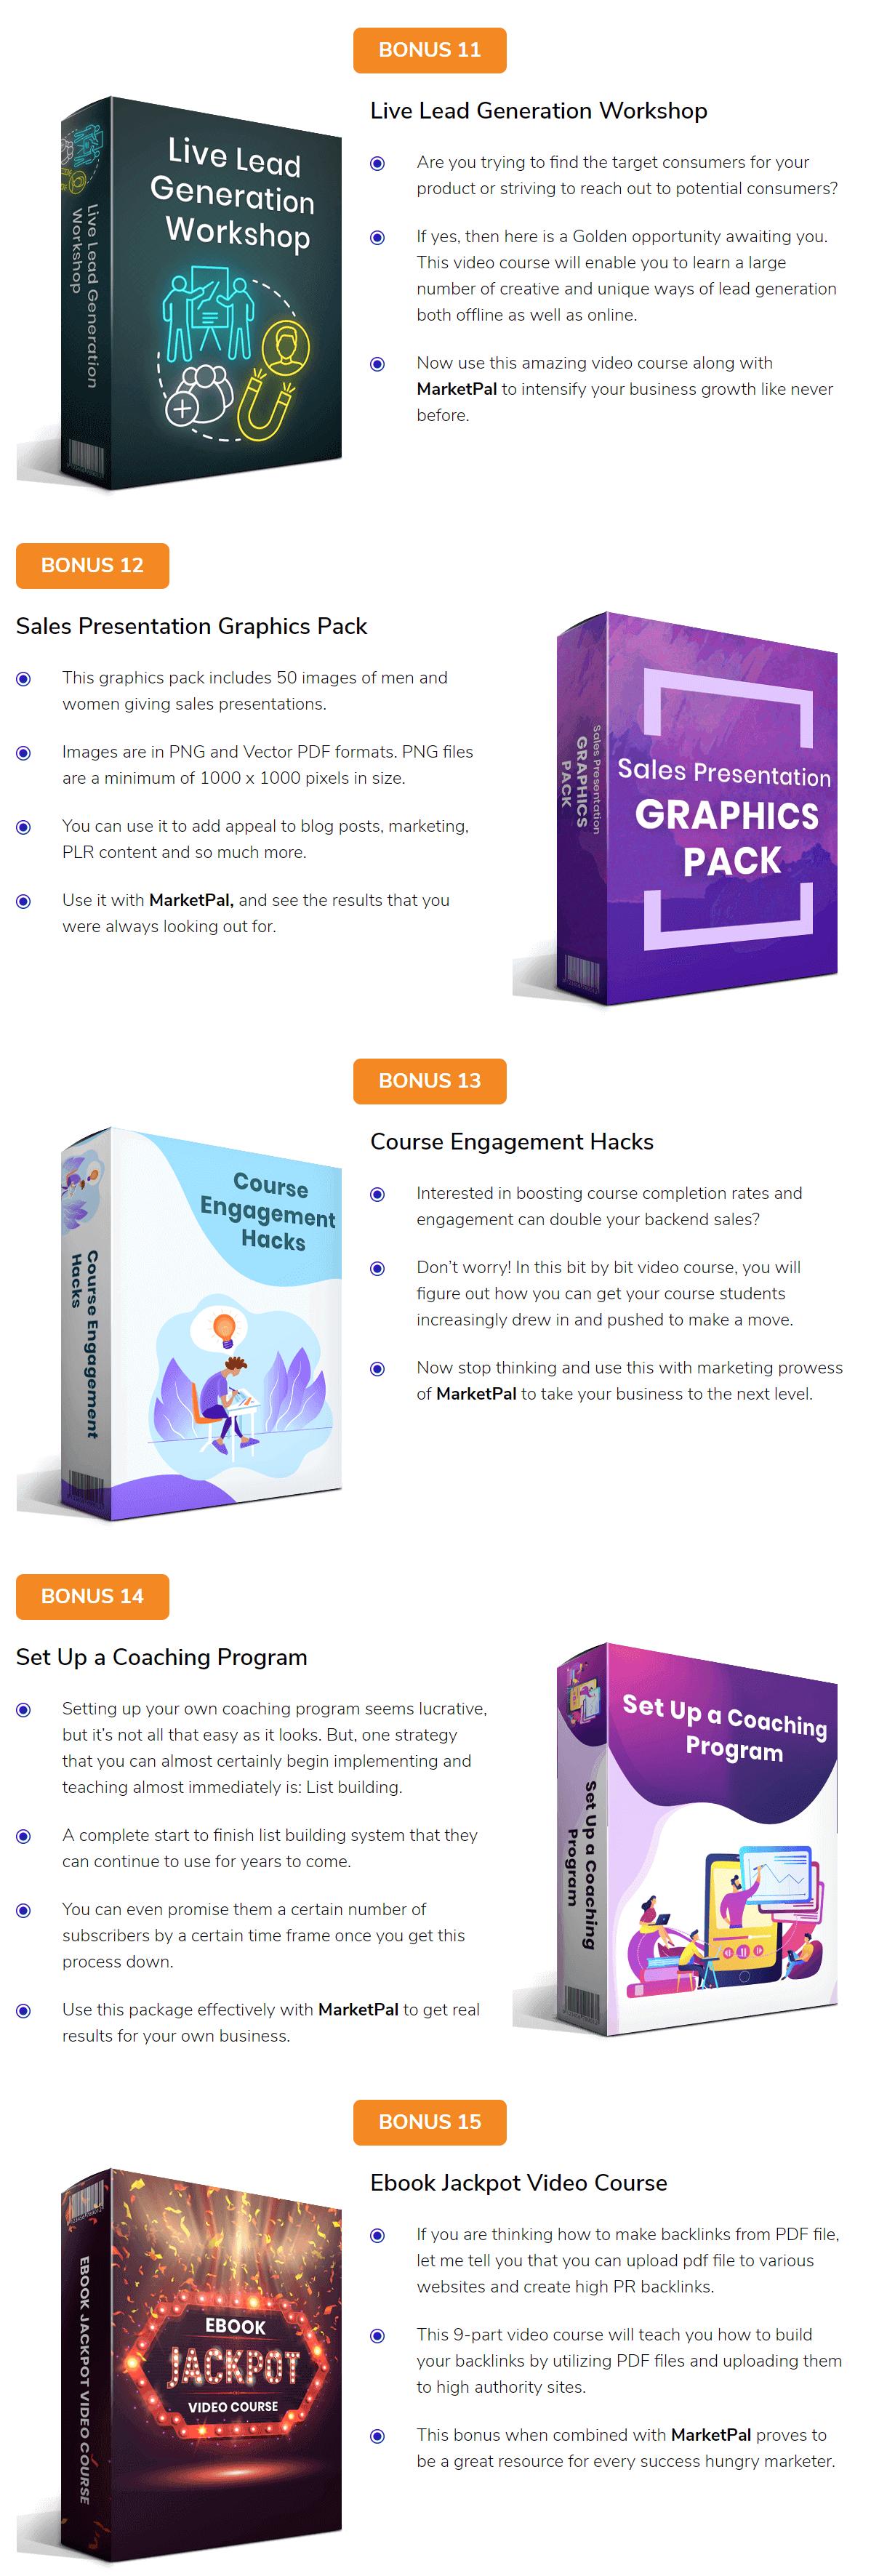 MarketPal-Review-Bonuses-3